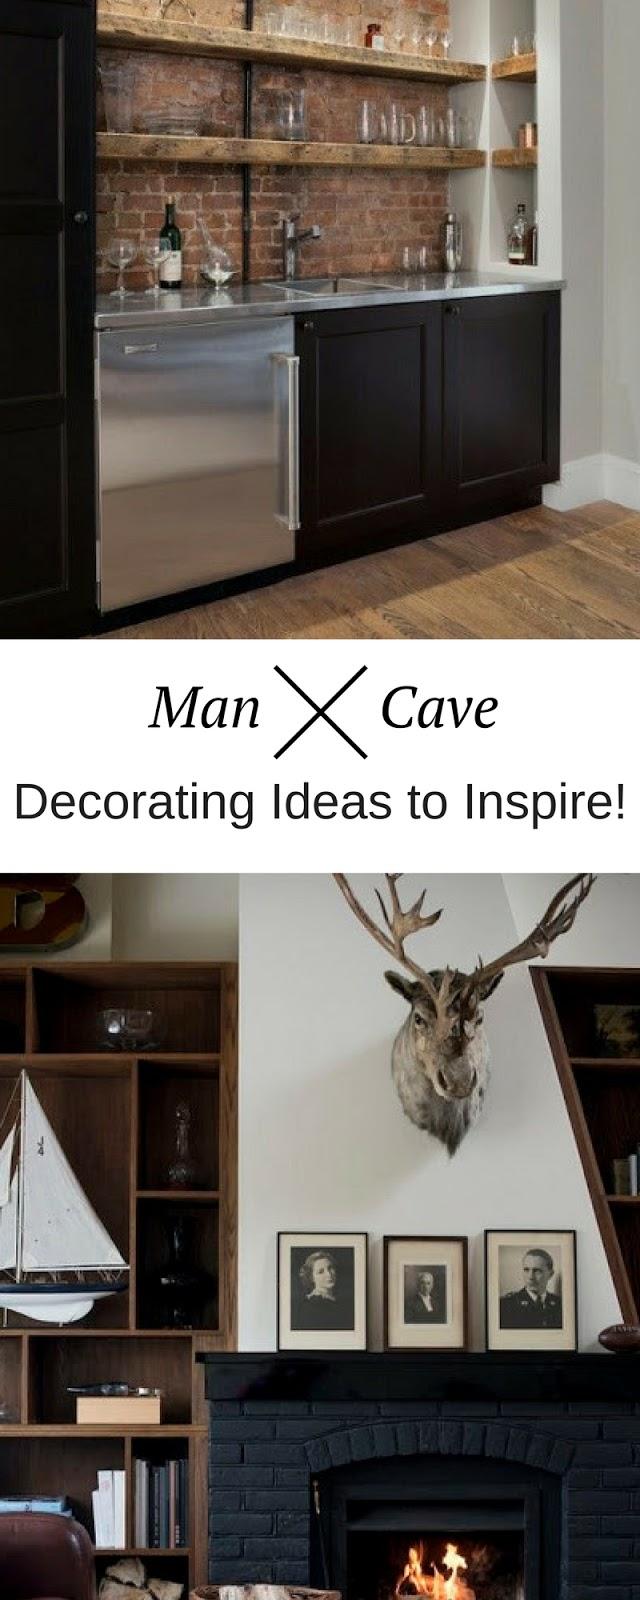 Man Cave Ideas Work : Masculine man cave decorating ideas home decor